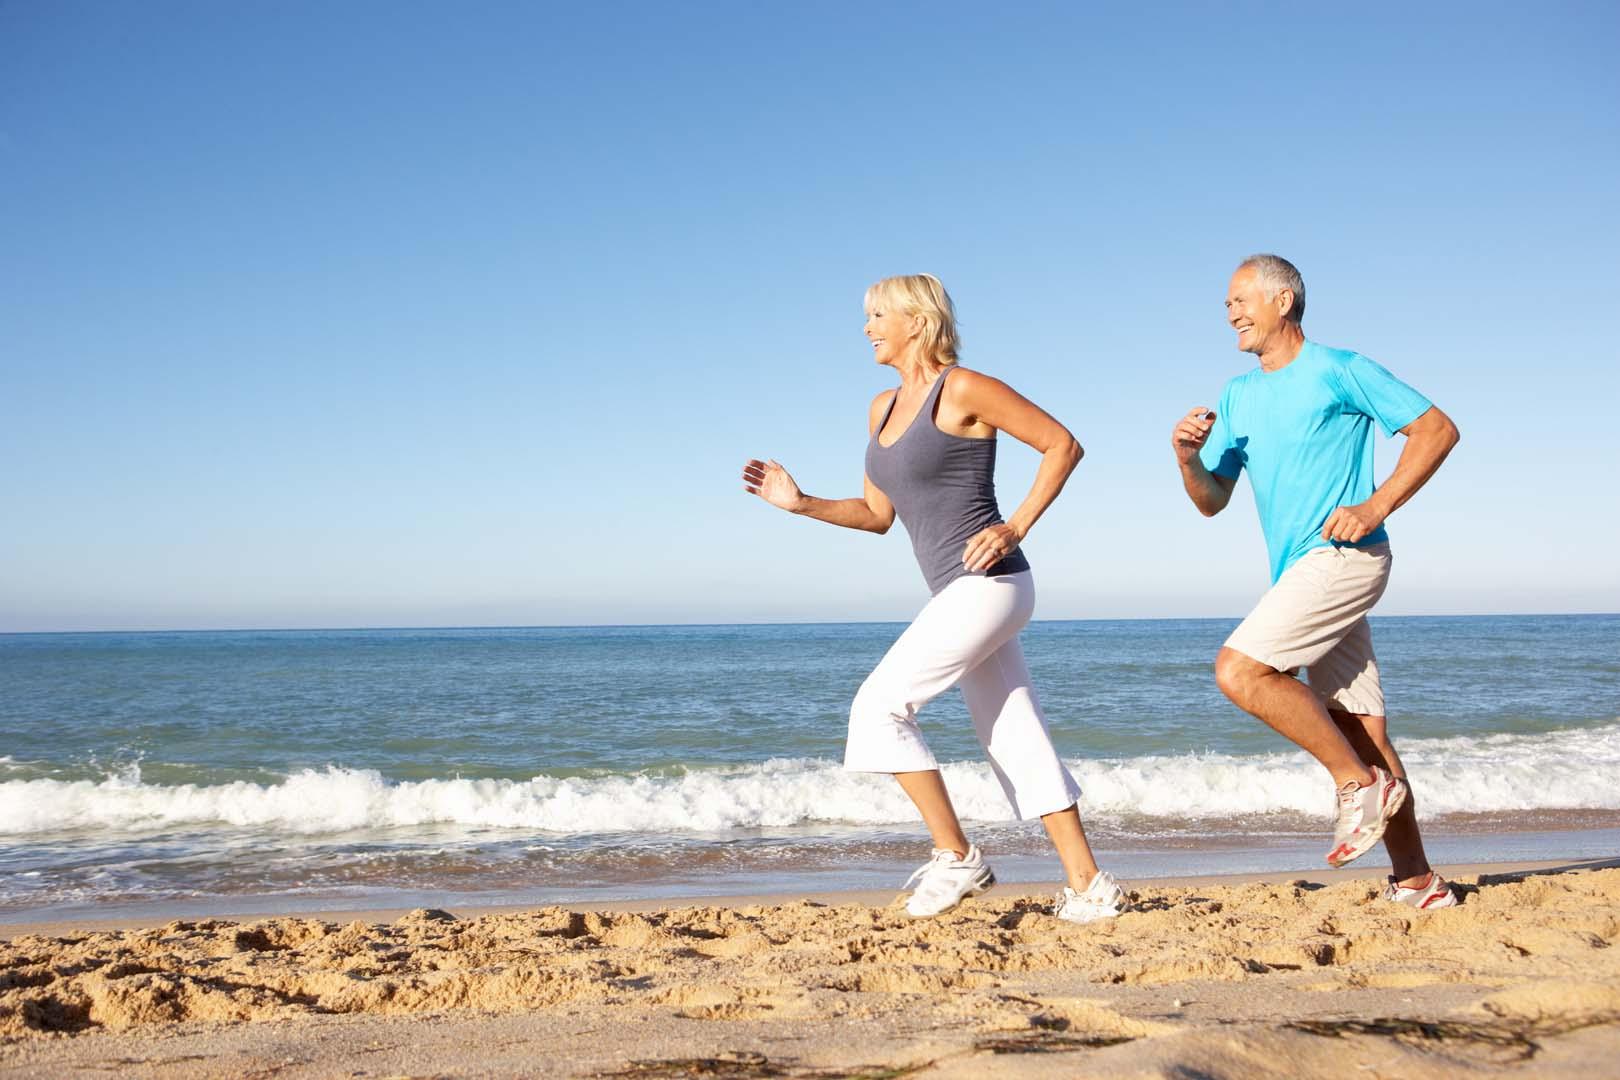 Bladder Control Management for Santa Barbara's Active Lifestyle